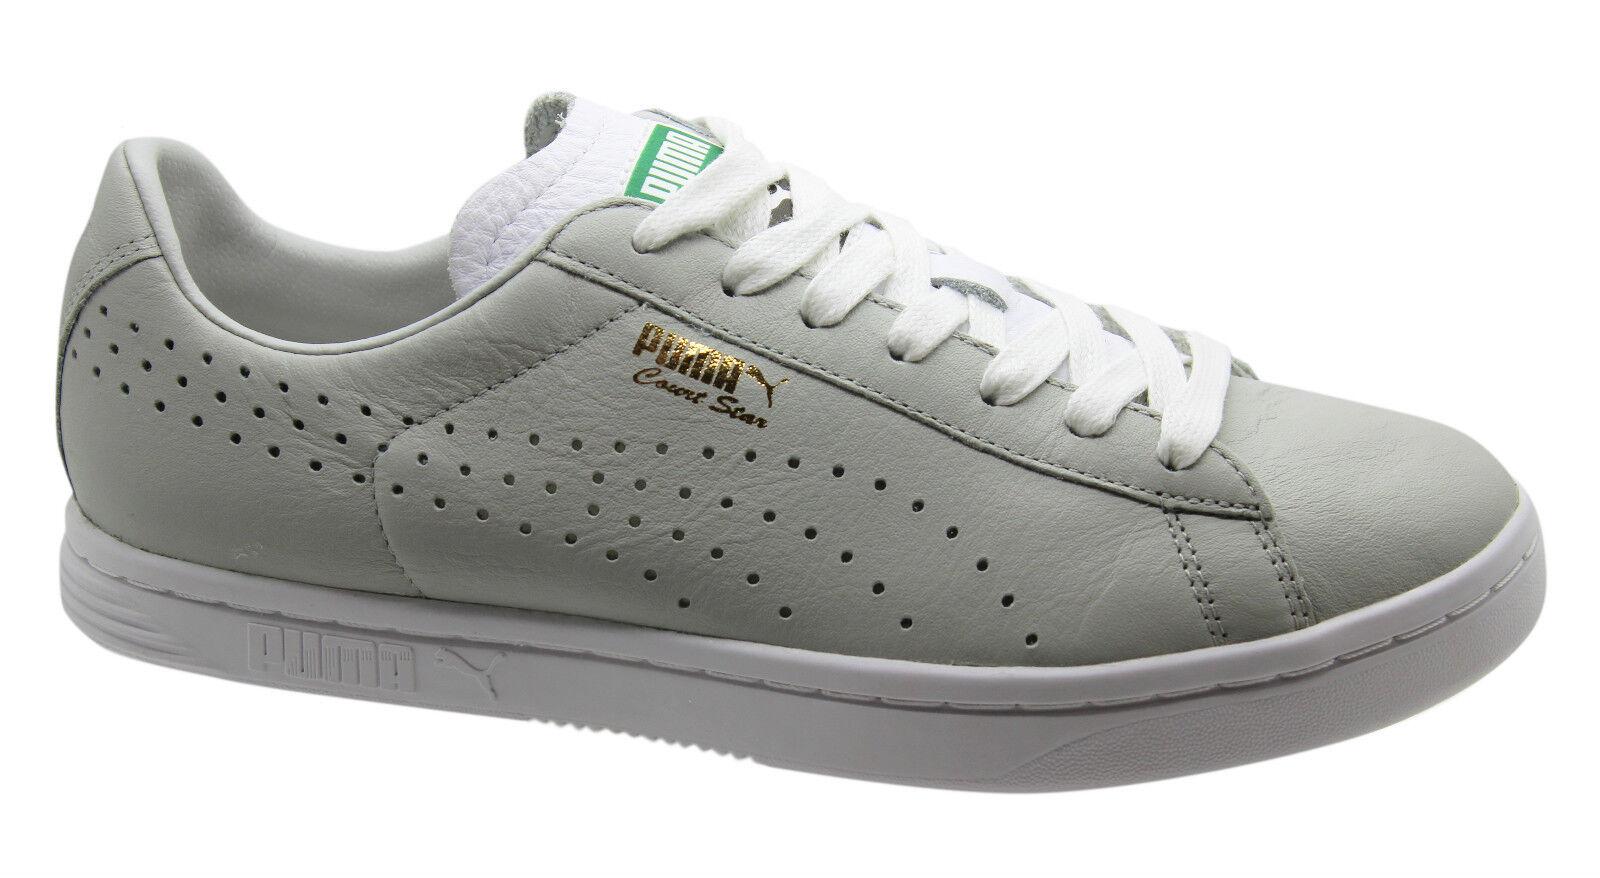 Puma Stelle a Corte NM shoes Sportive men Basse pelle grey con Lacci 357883